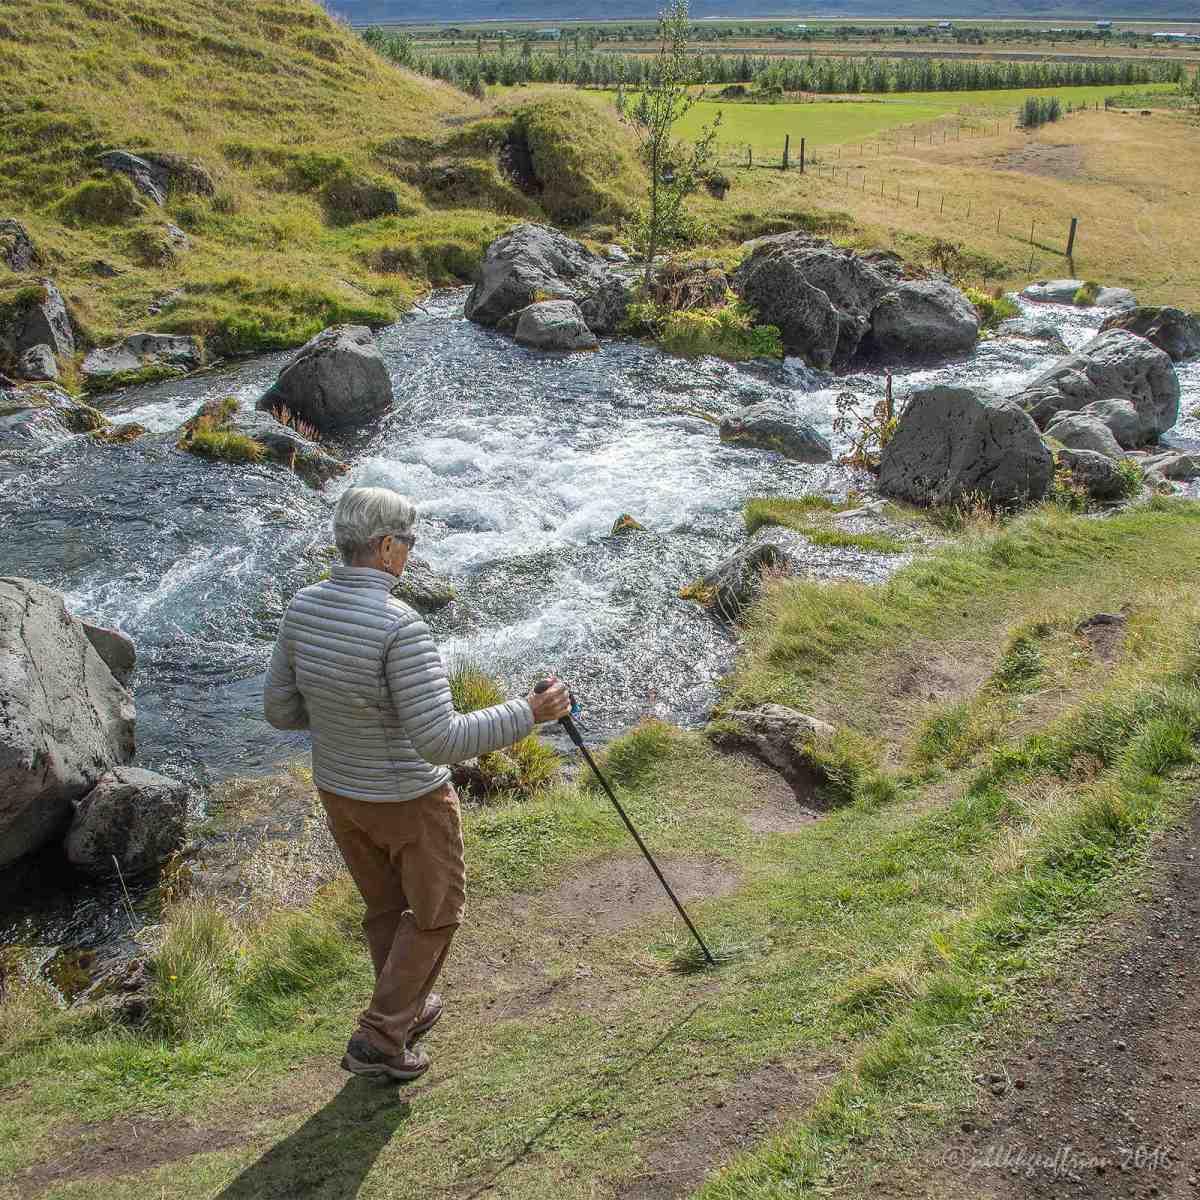 Jill's Spill in Iceland